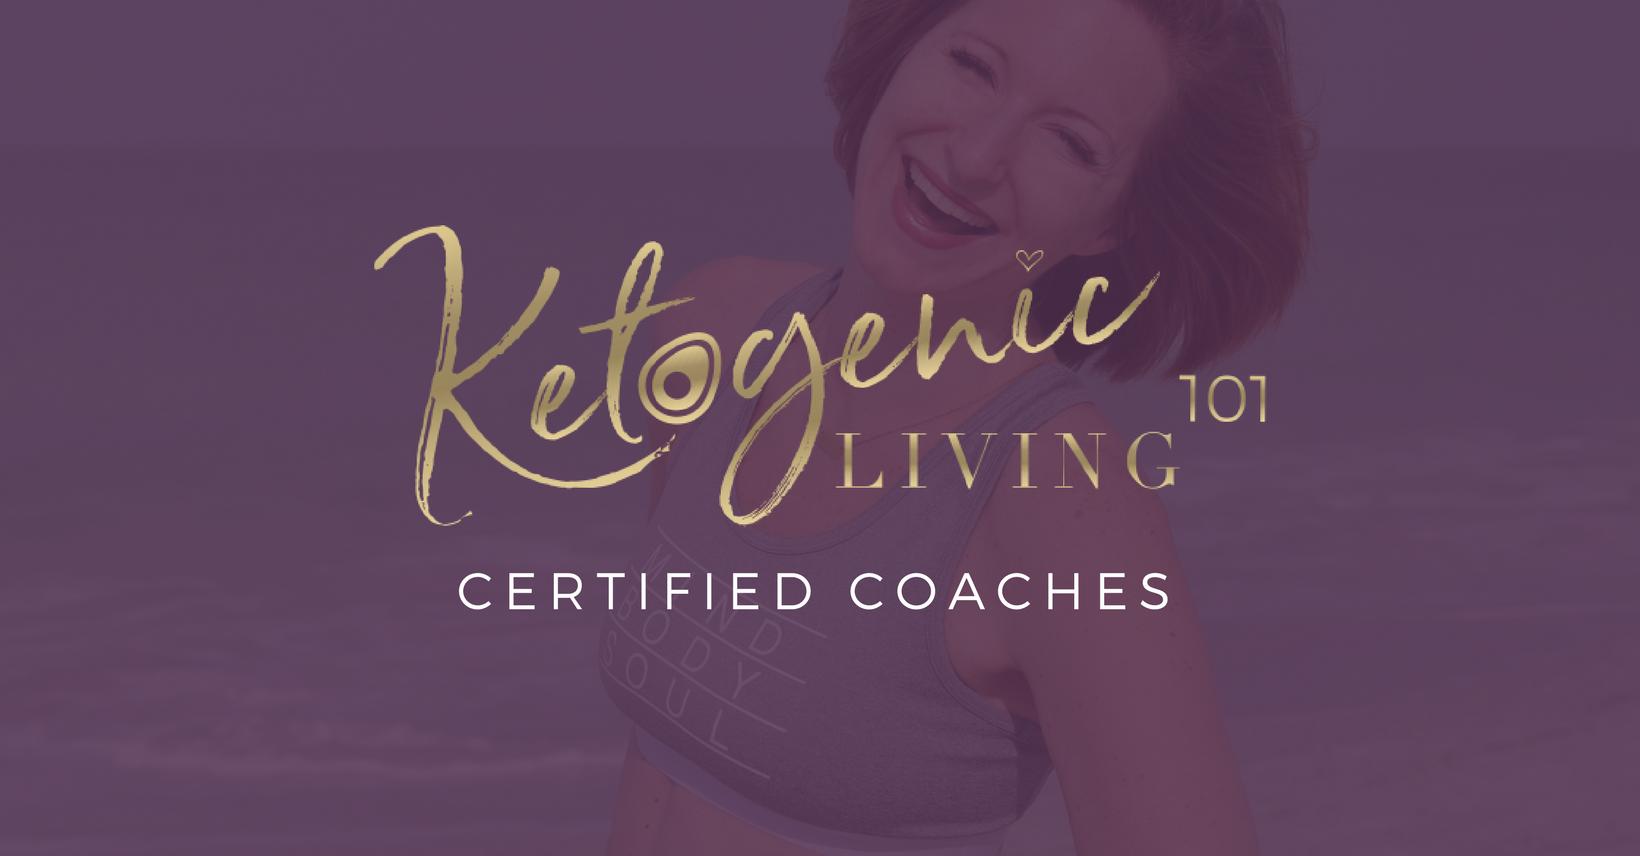 Become a Certified Keto Coach